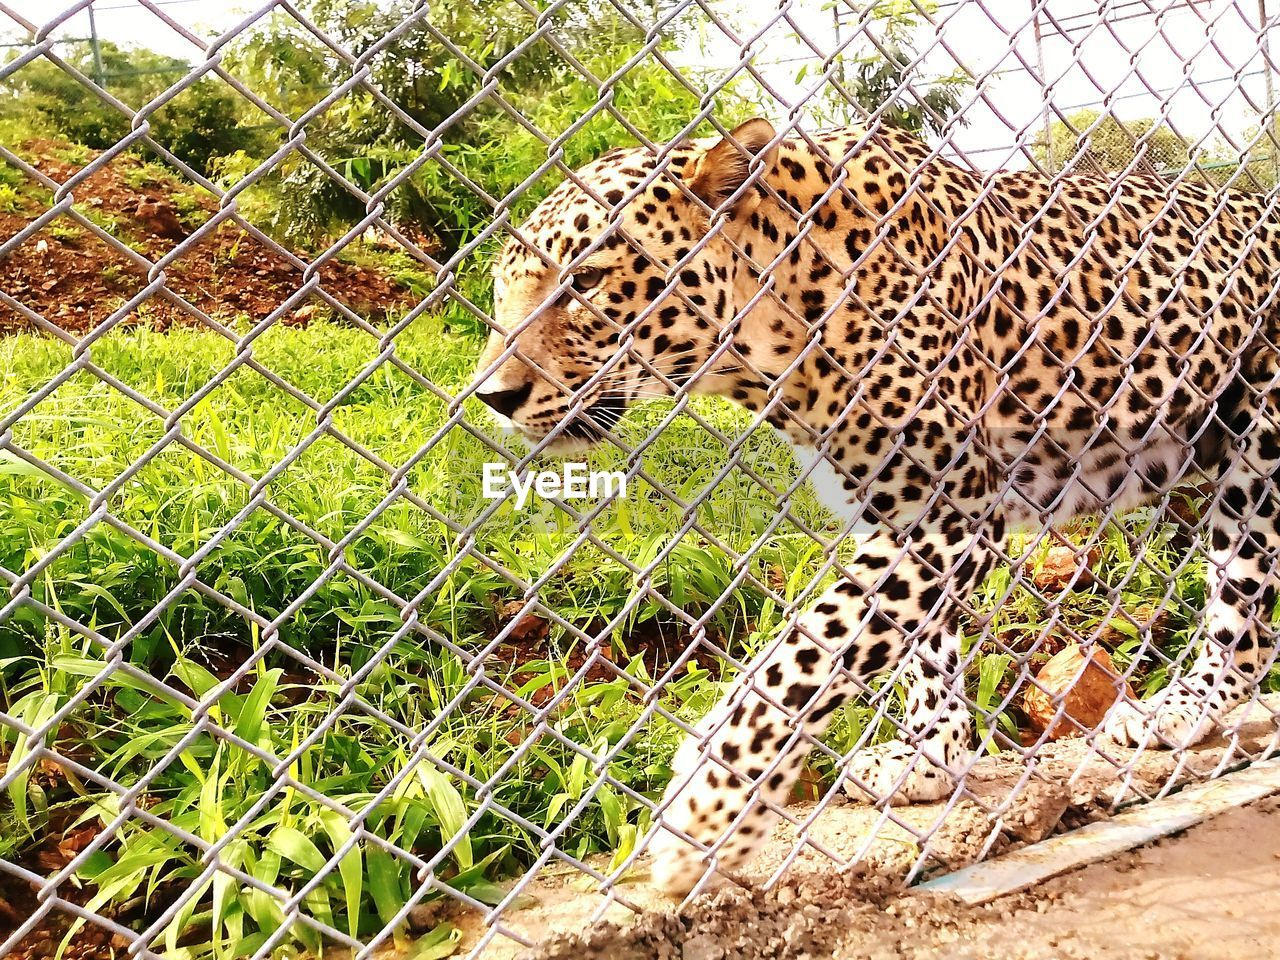 one animal, animal themes, leopard, animals in the wild, mammal, feline, day, outdoors, animal wildlife, safari animals, no people, nature